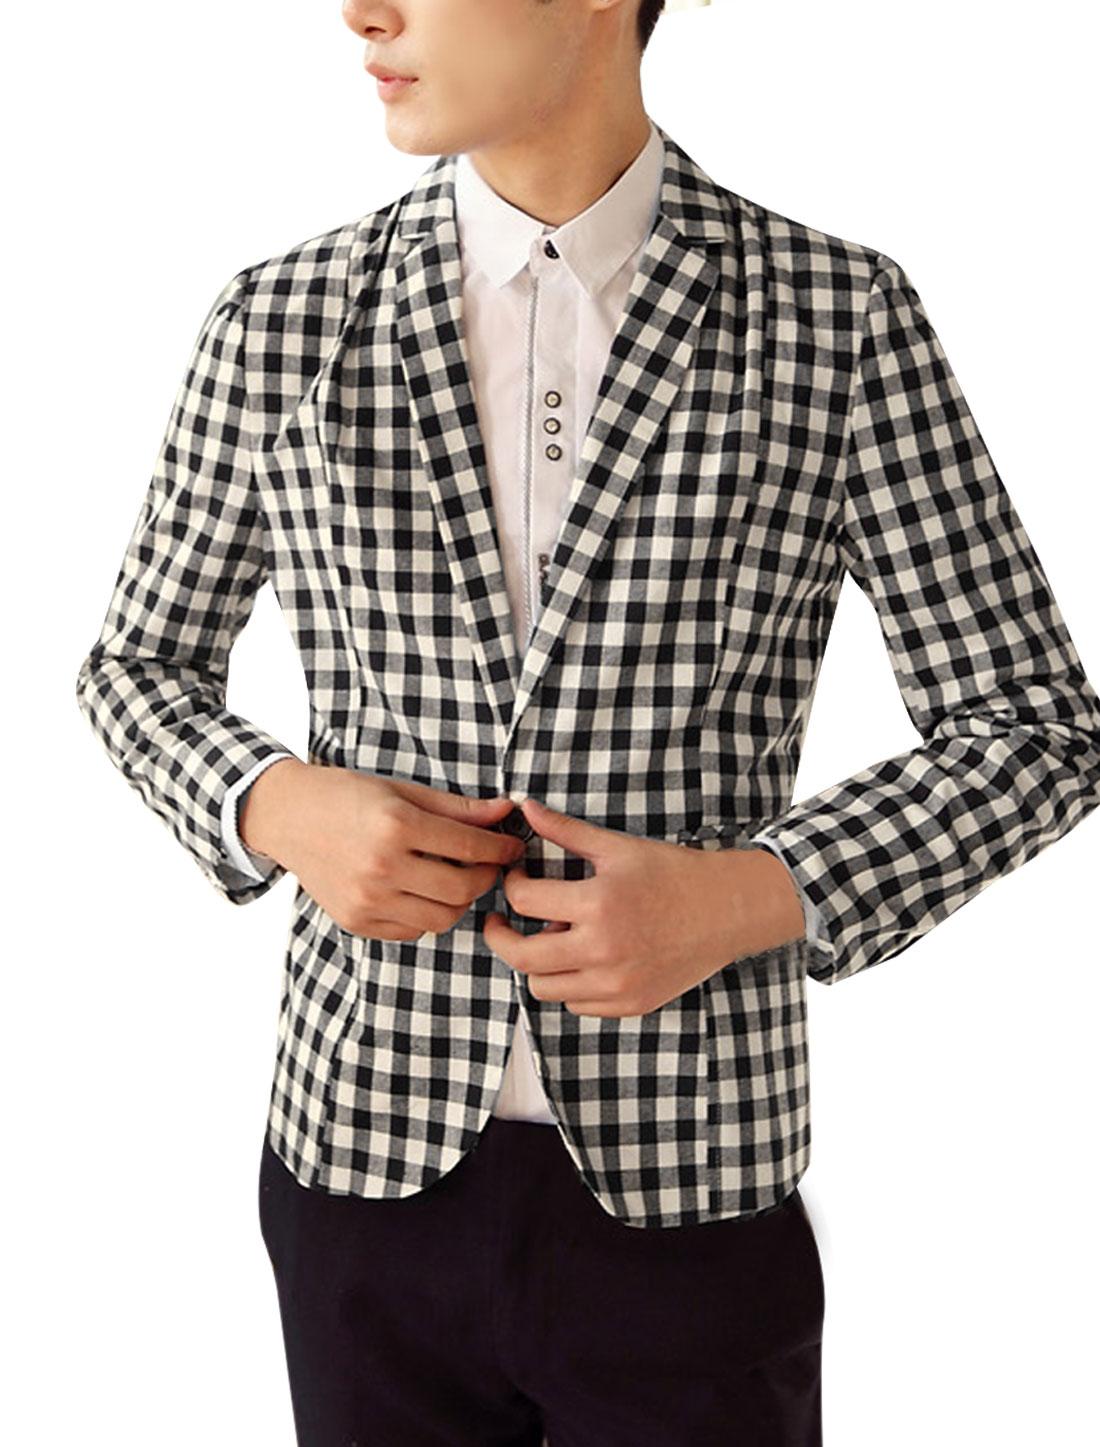 Men's Black White Plaids One Button Casual Blazer Jacket S